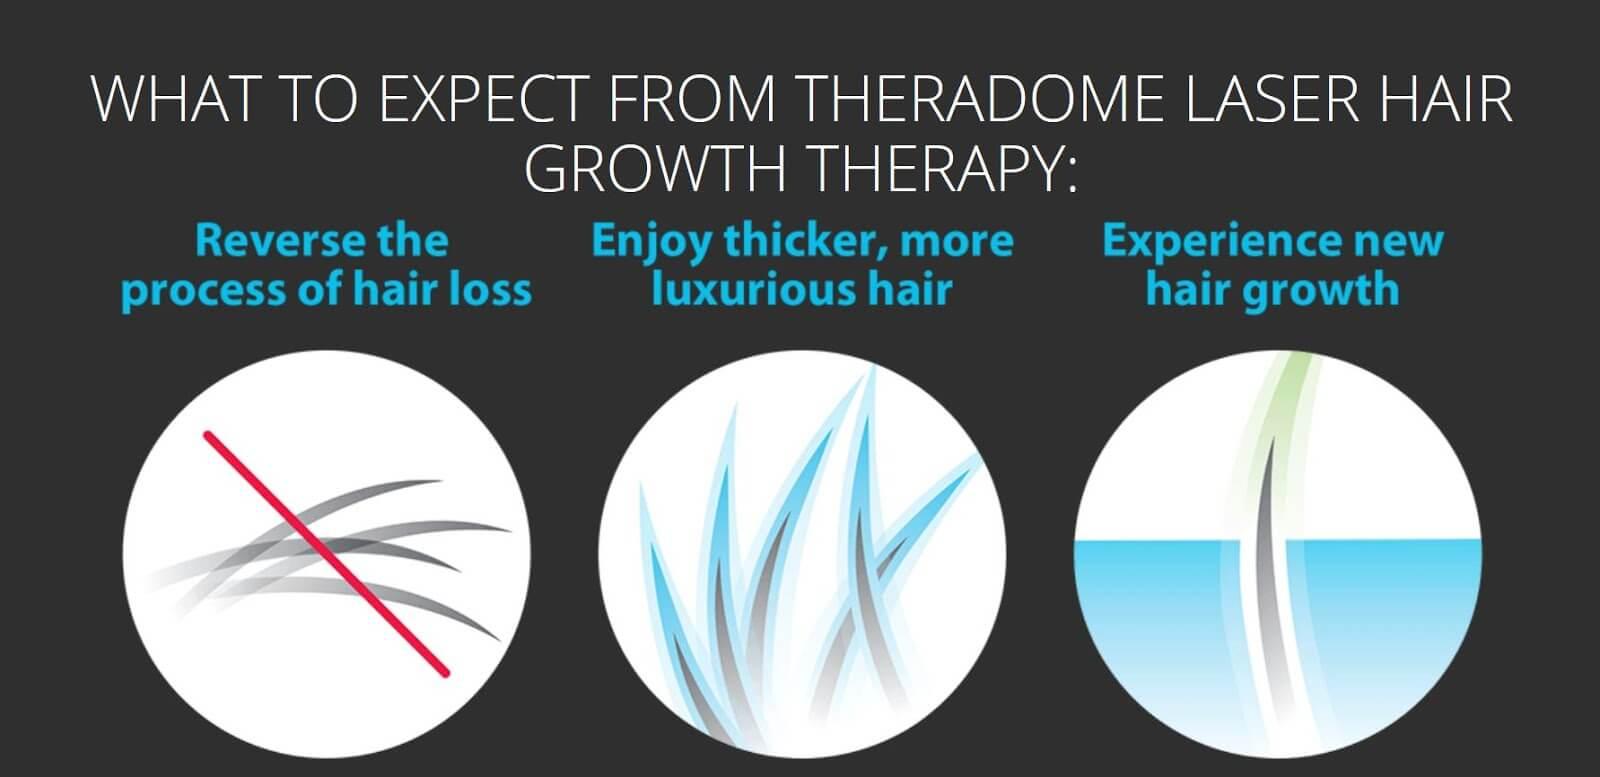 theradome-hair-regrowth-factor-chart-sarasota-hair-clinic